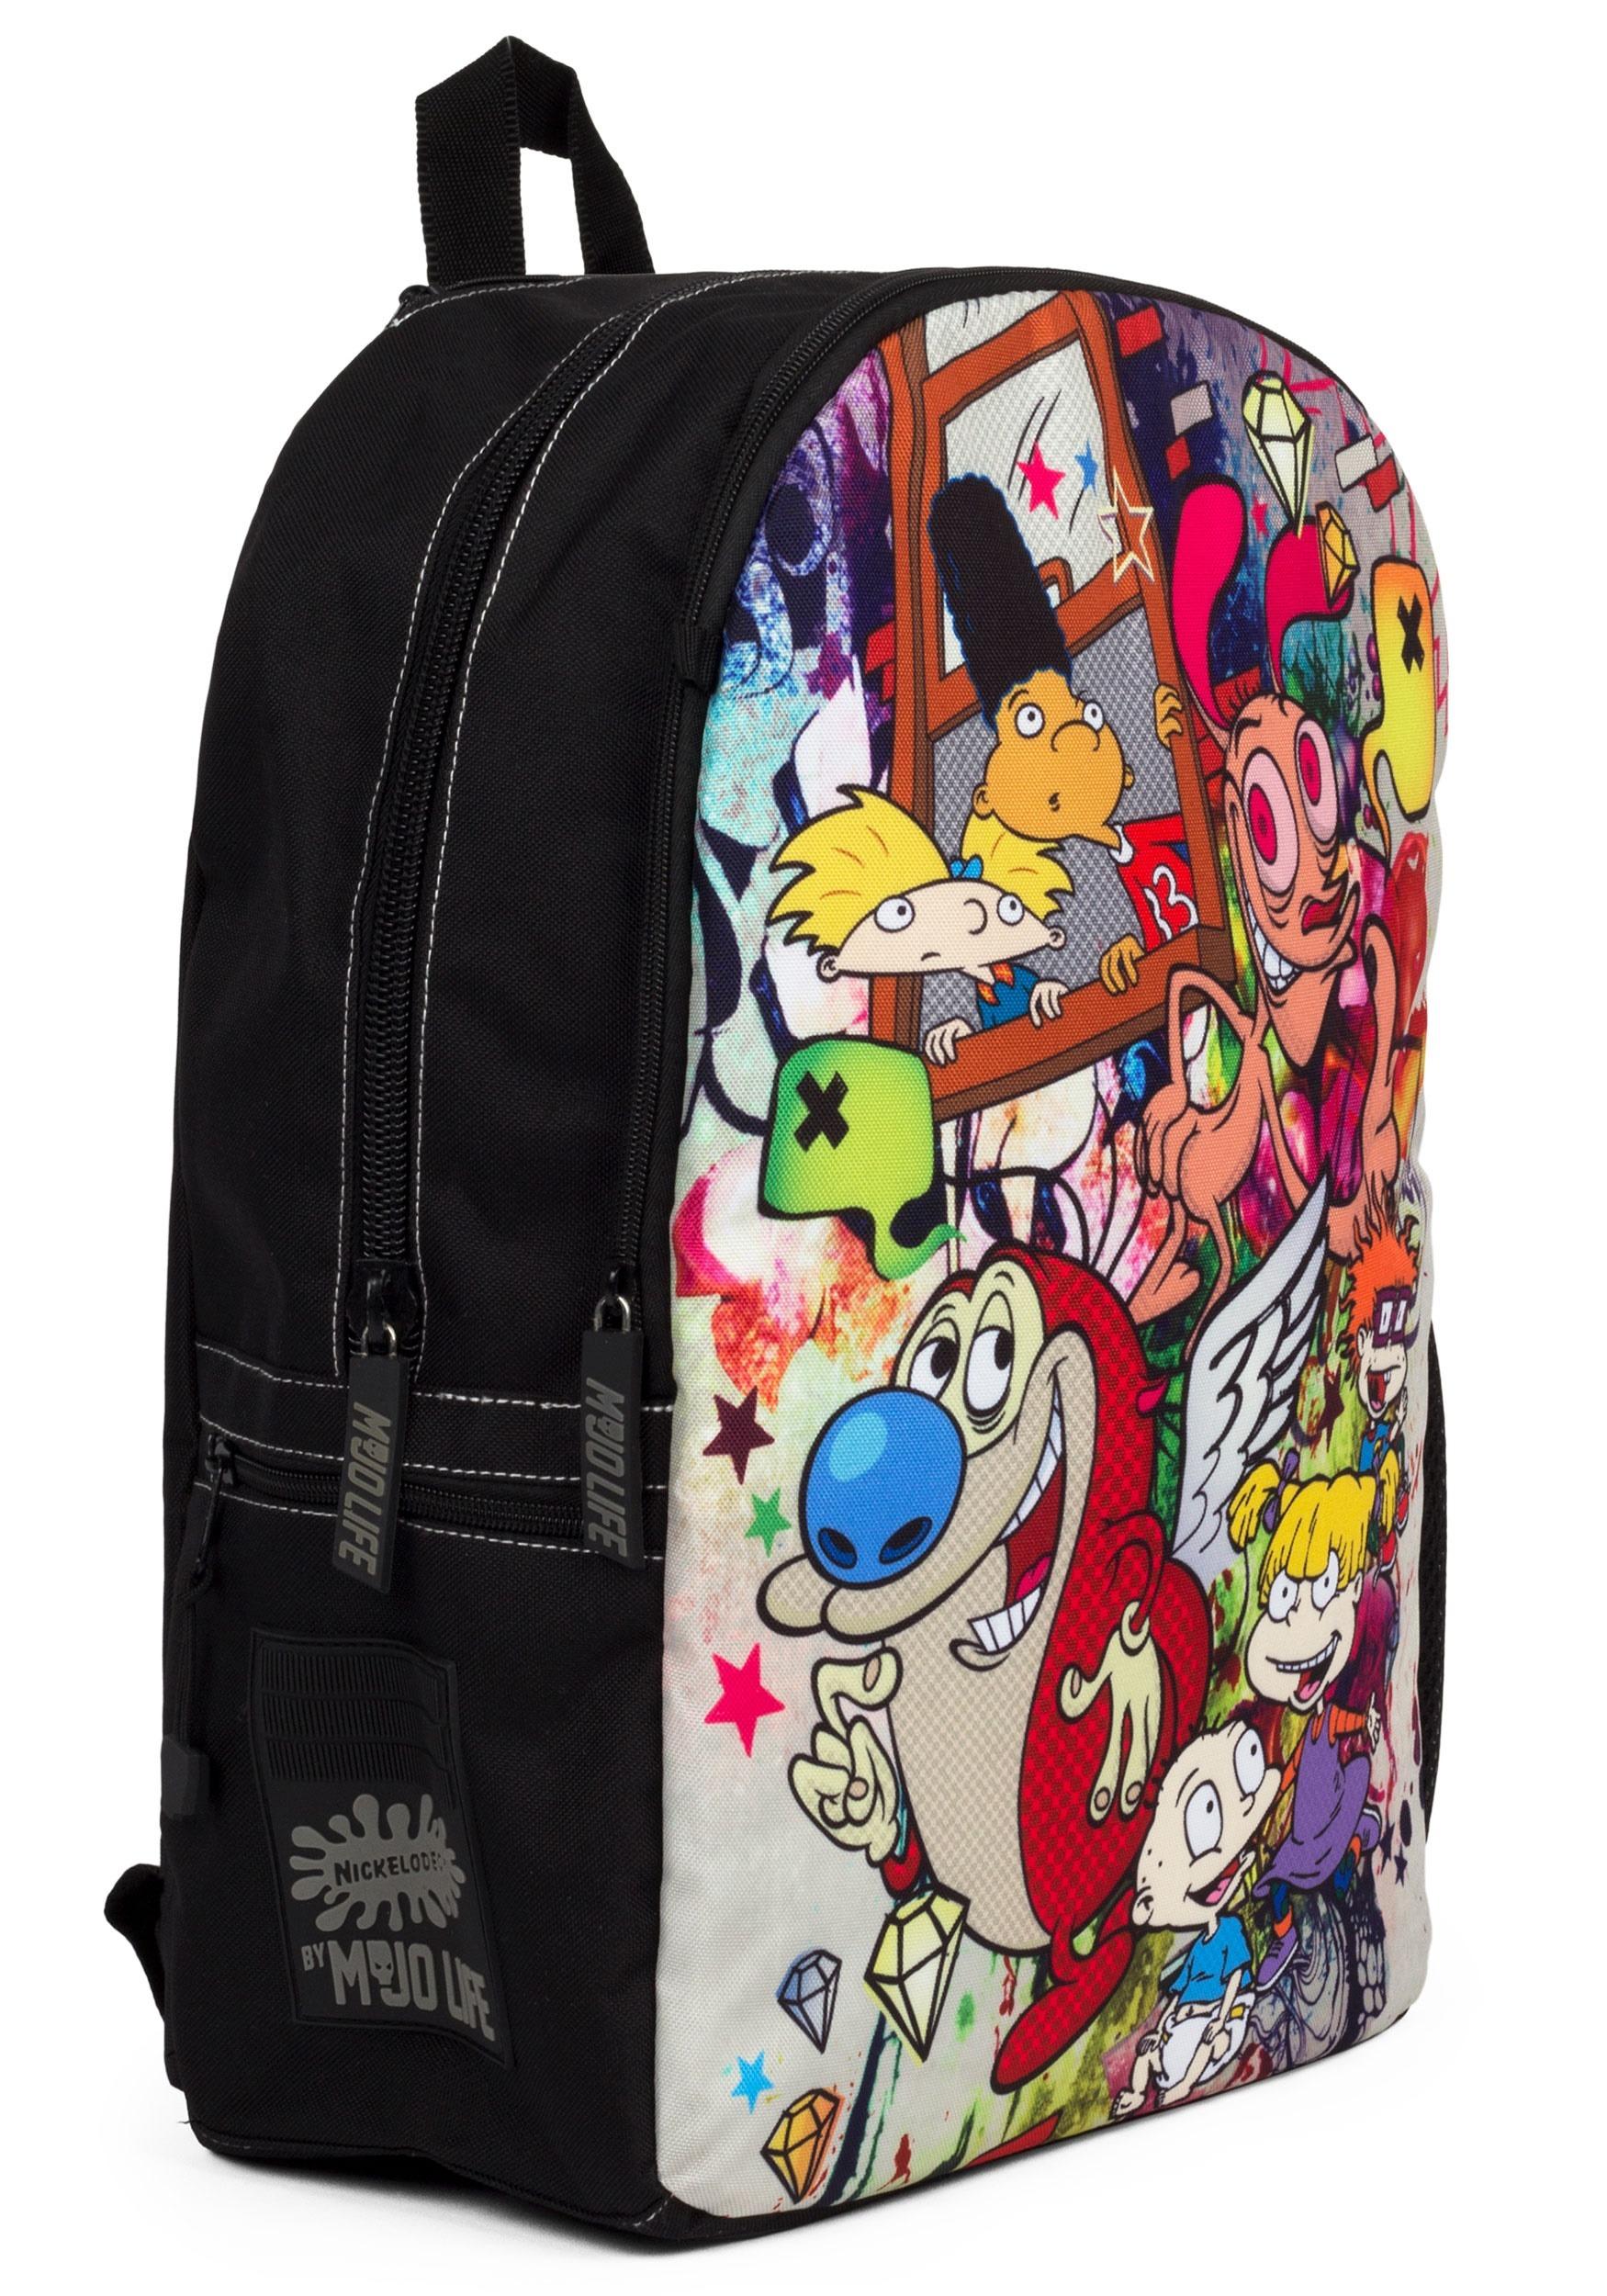 Mojo life nick graffiti mashup 90s backpack alt1